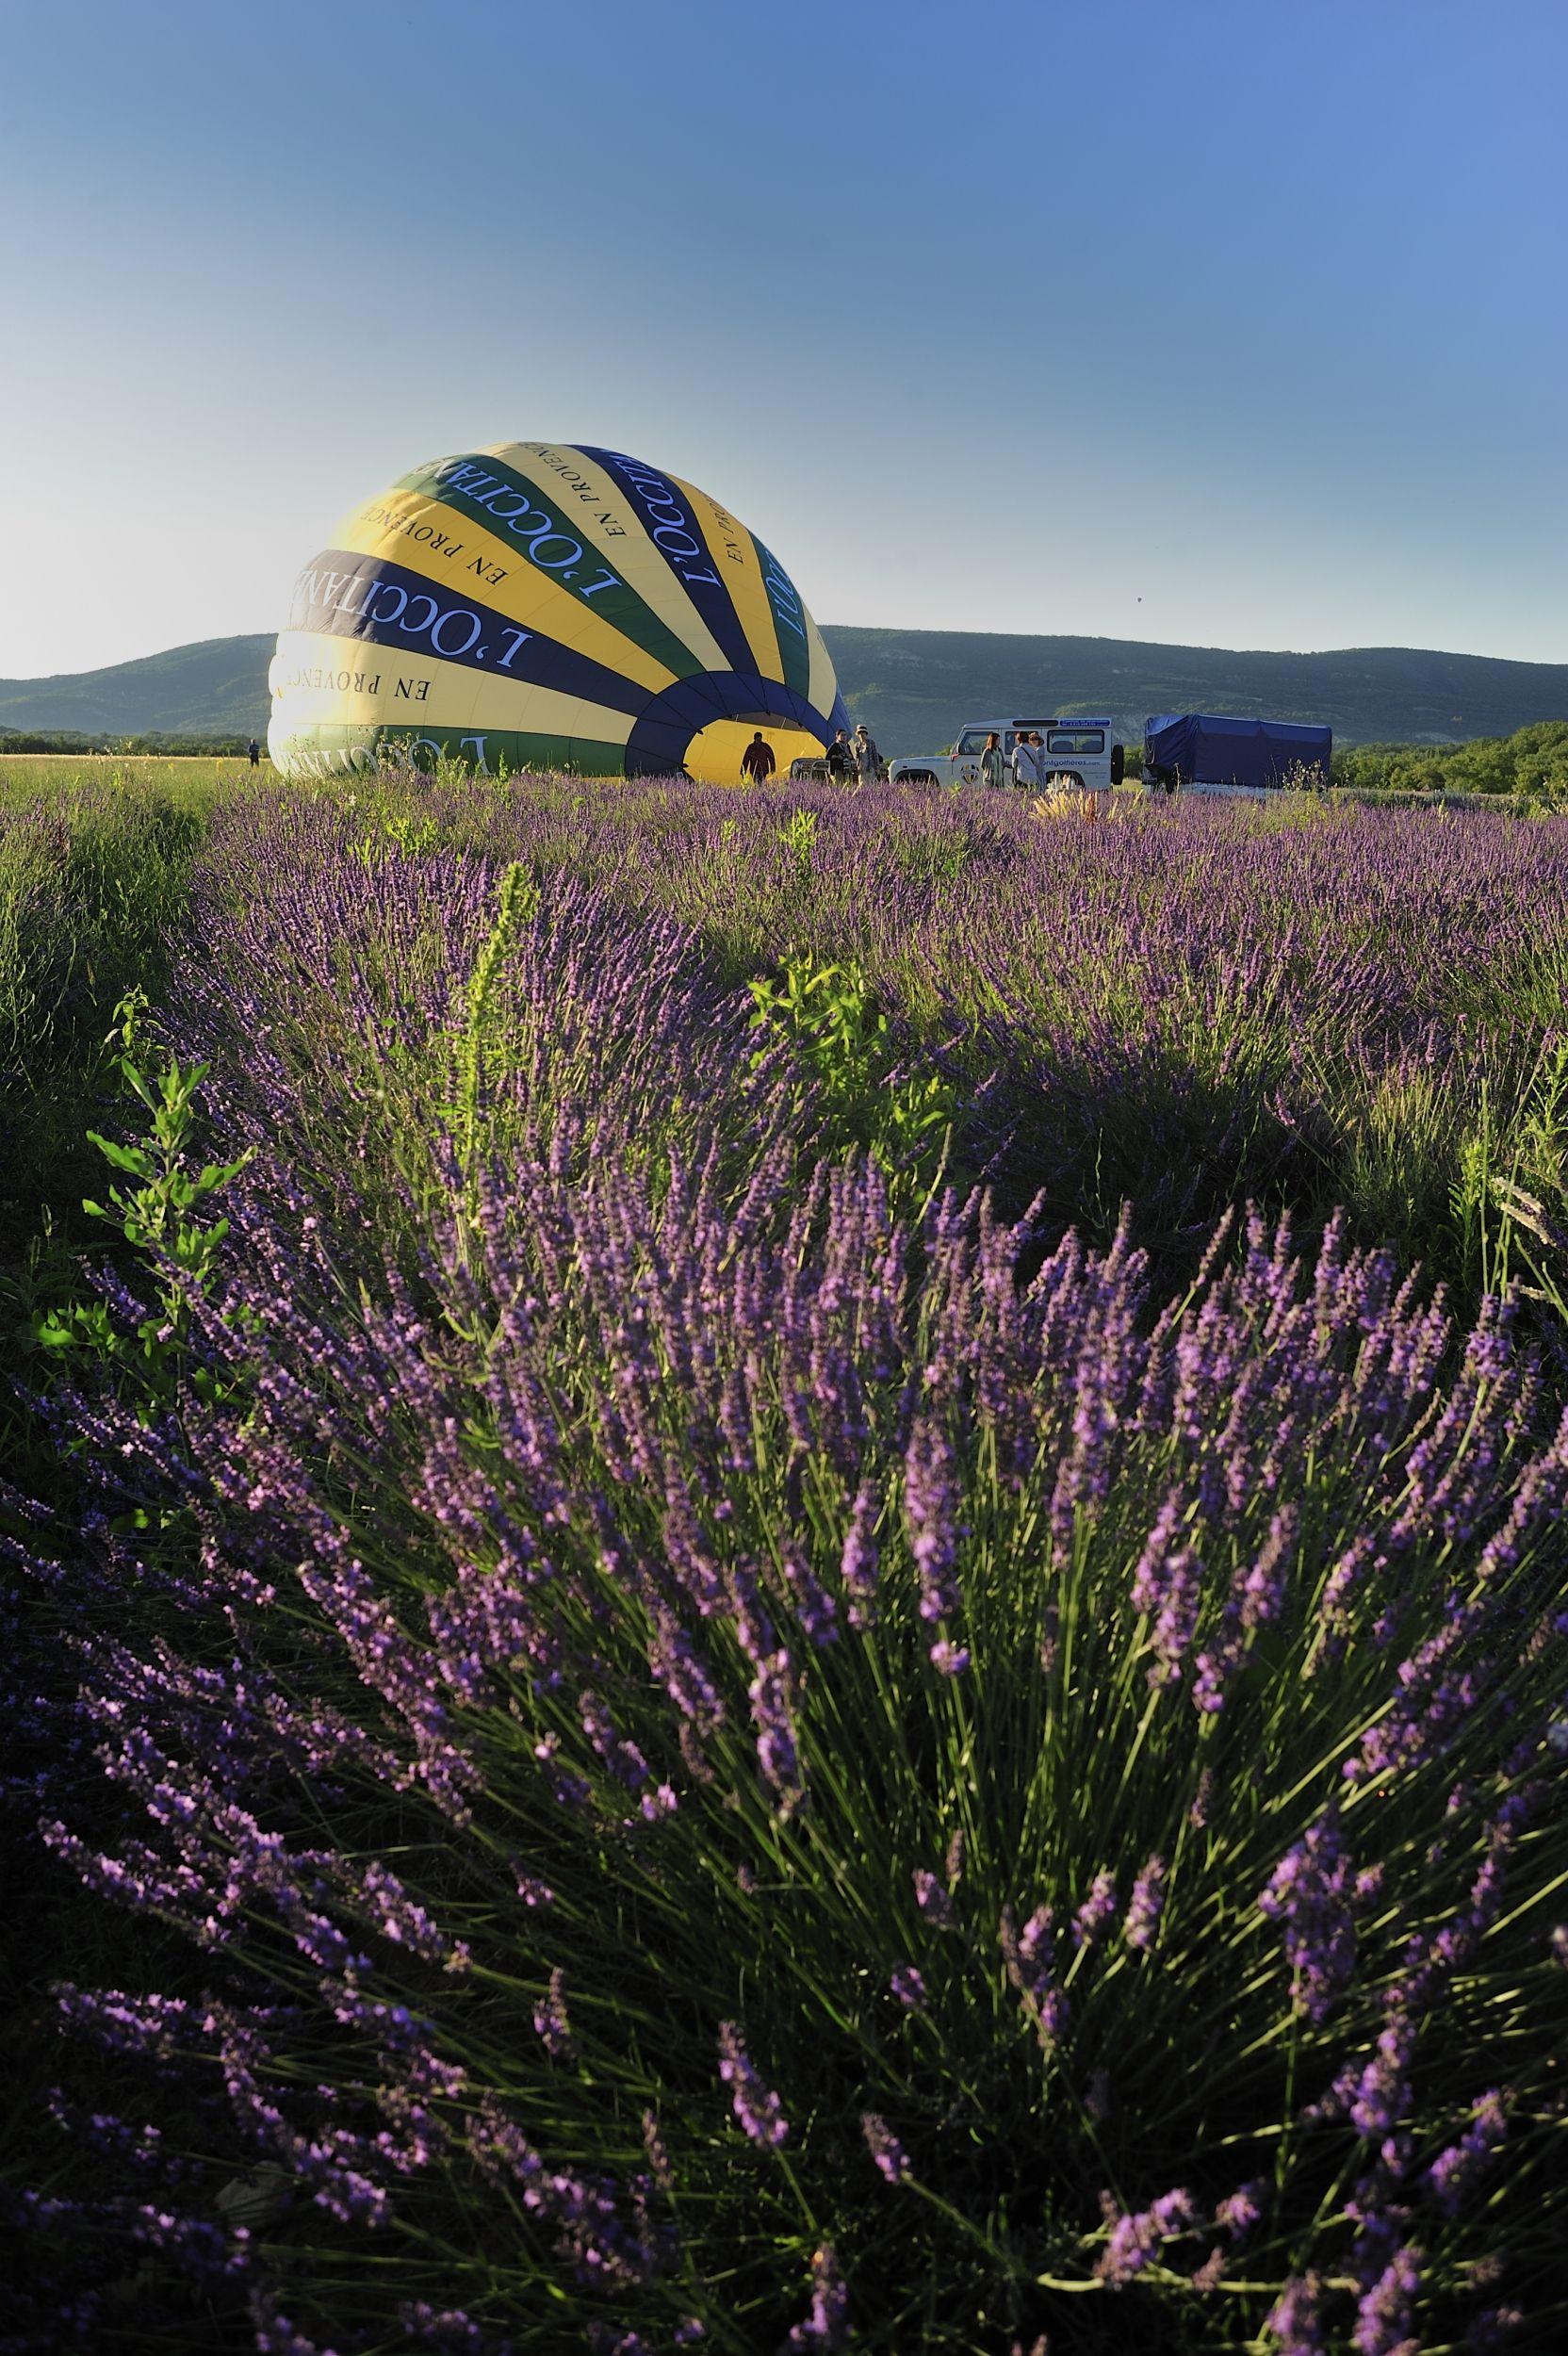 Among The Fragrant Lavender Fields This Balloon Starts Its Journey Loccitane En Provence Loccitane And Repinforsweetskin Campo De Lavanda Em 2019 Ceu